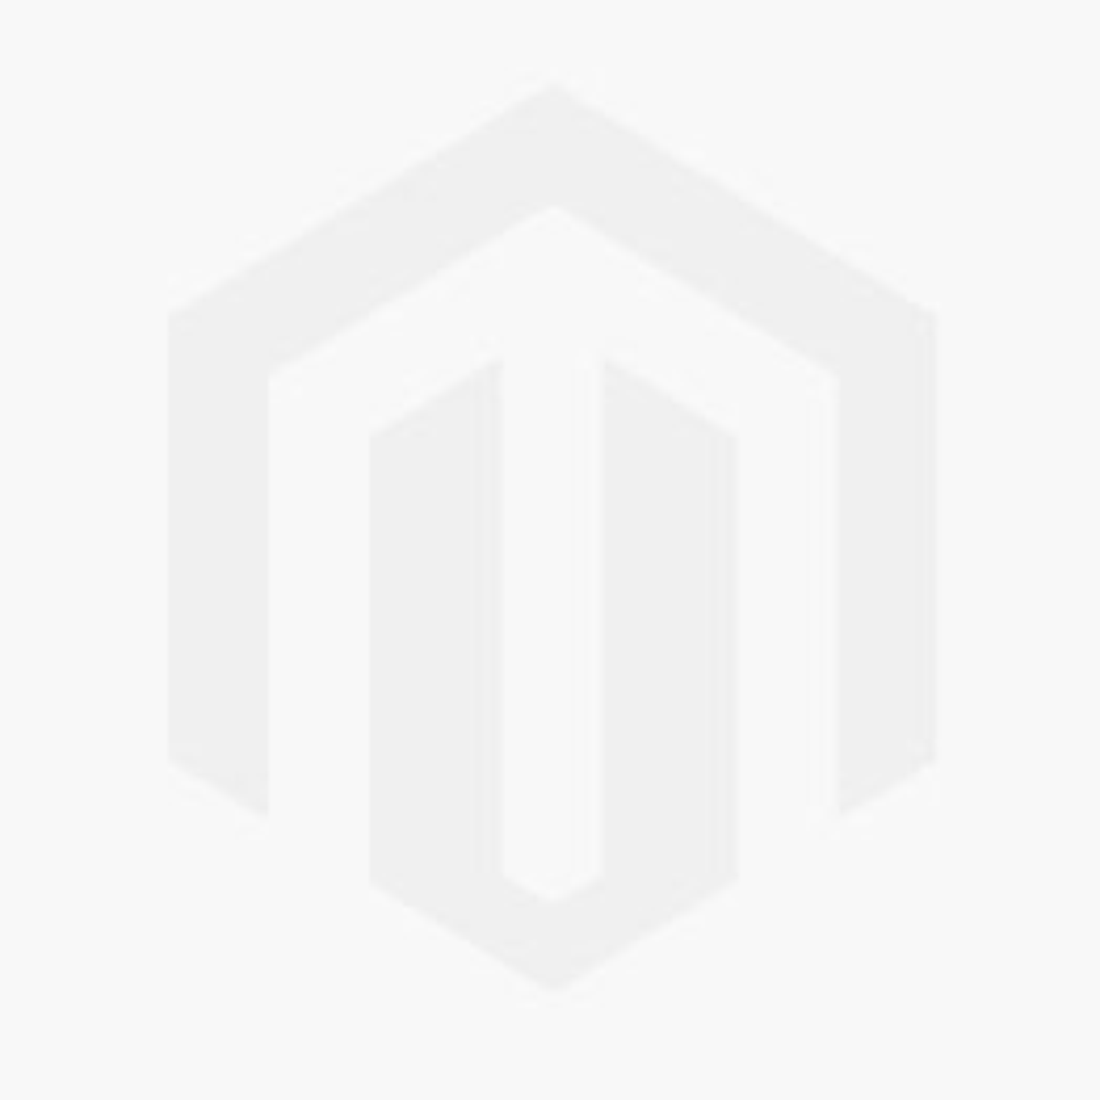 PC A6 Bowey Garden Shed